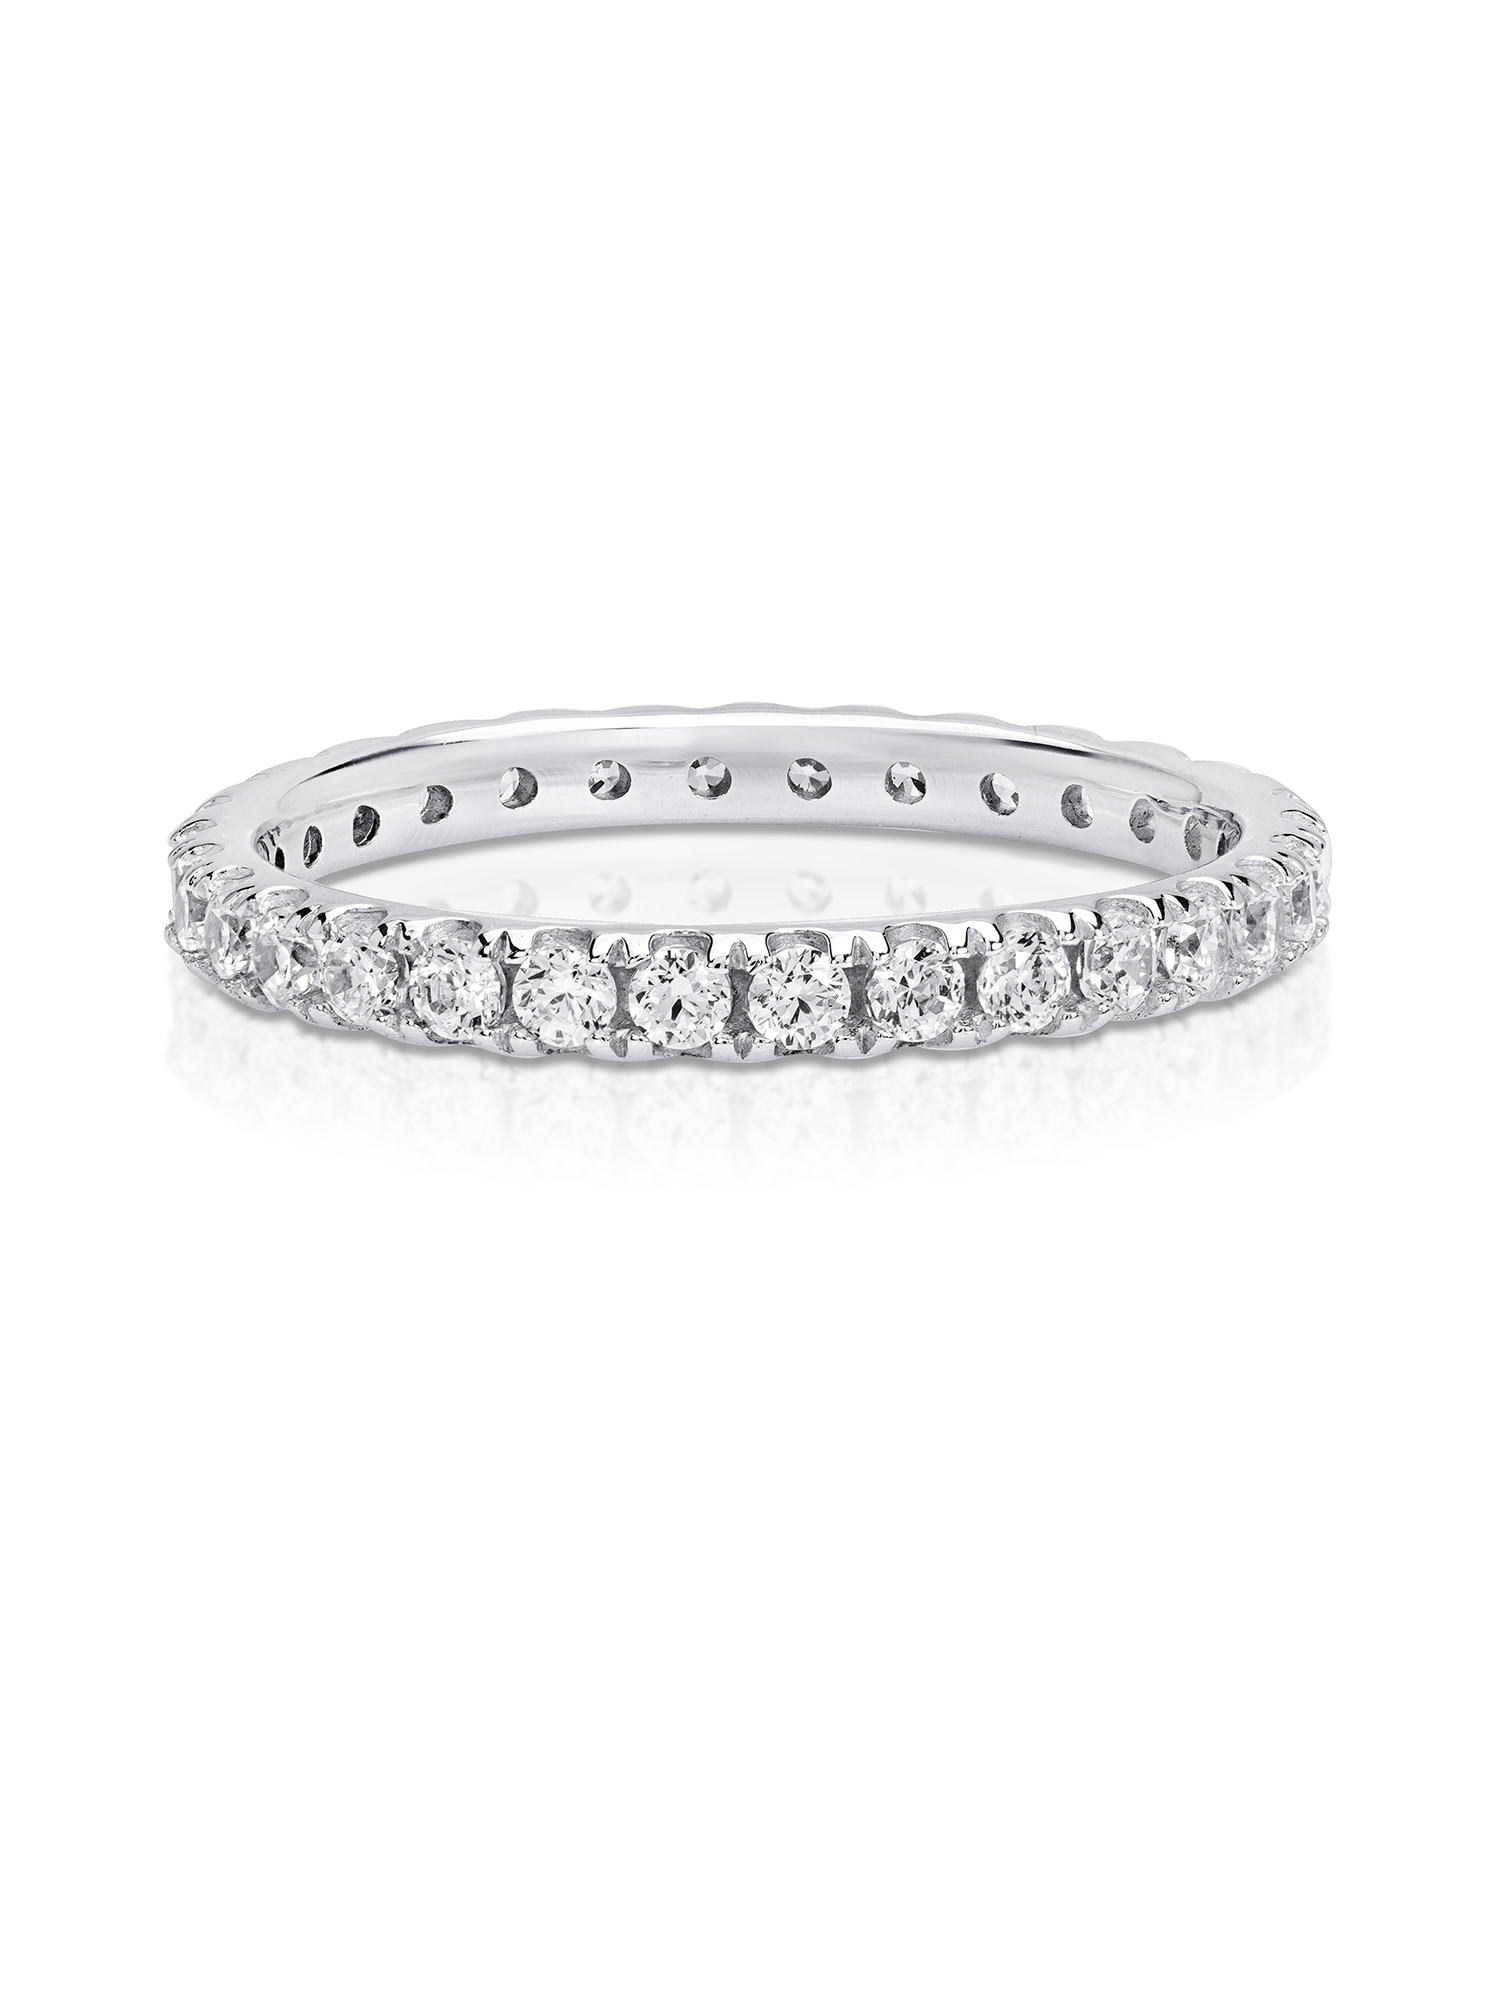 Cubic Zirconia Eternity Ring made with Zirconia from Swarovski